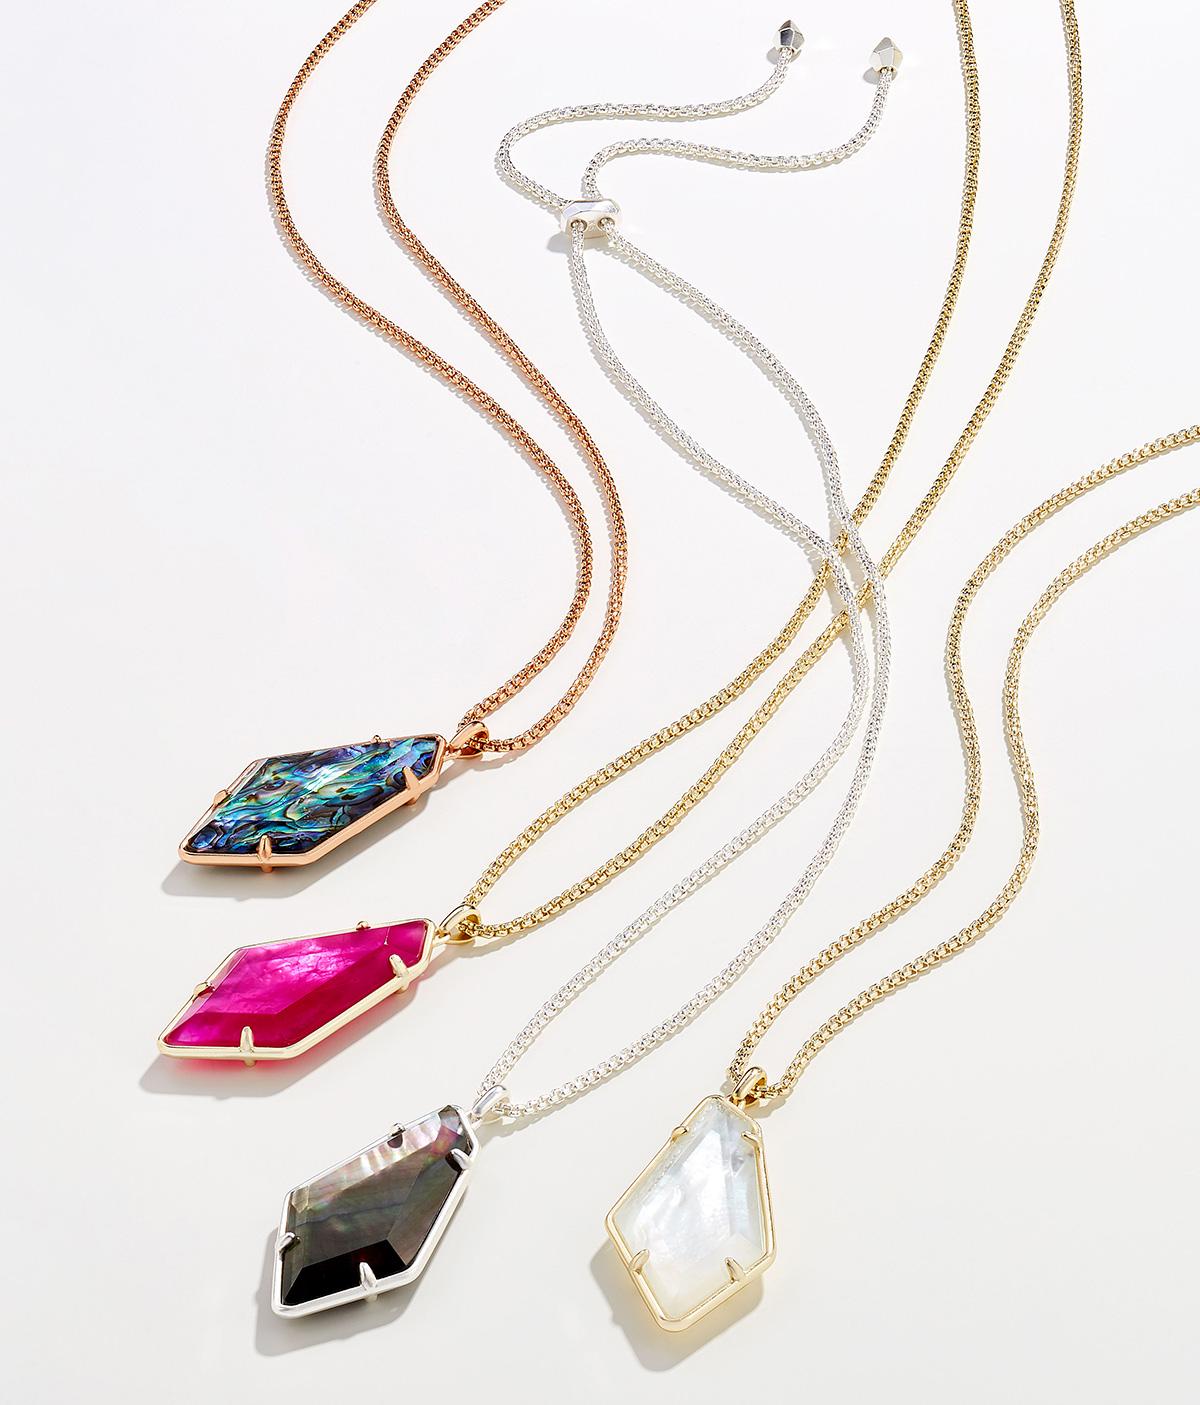 Most Popular Jewelry: Find Jewelry Stores Near Me